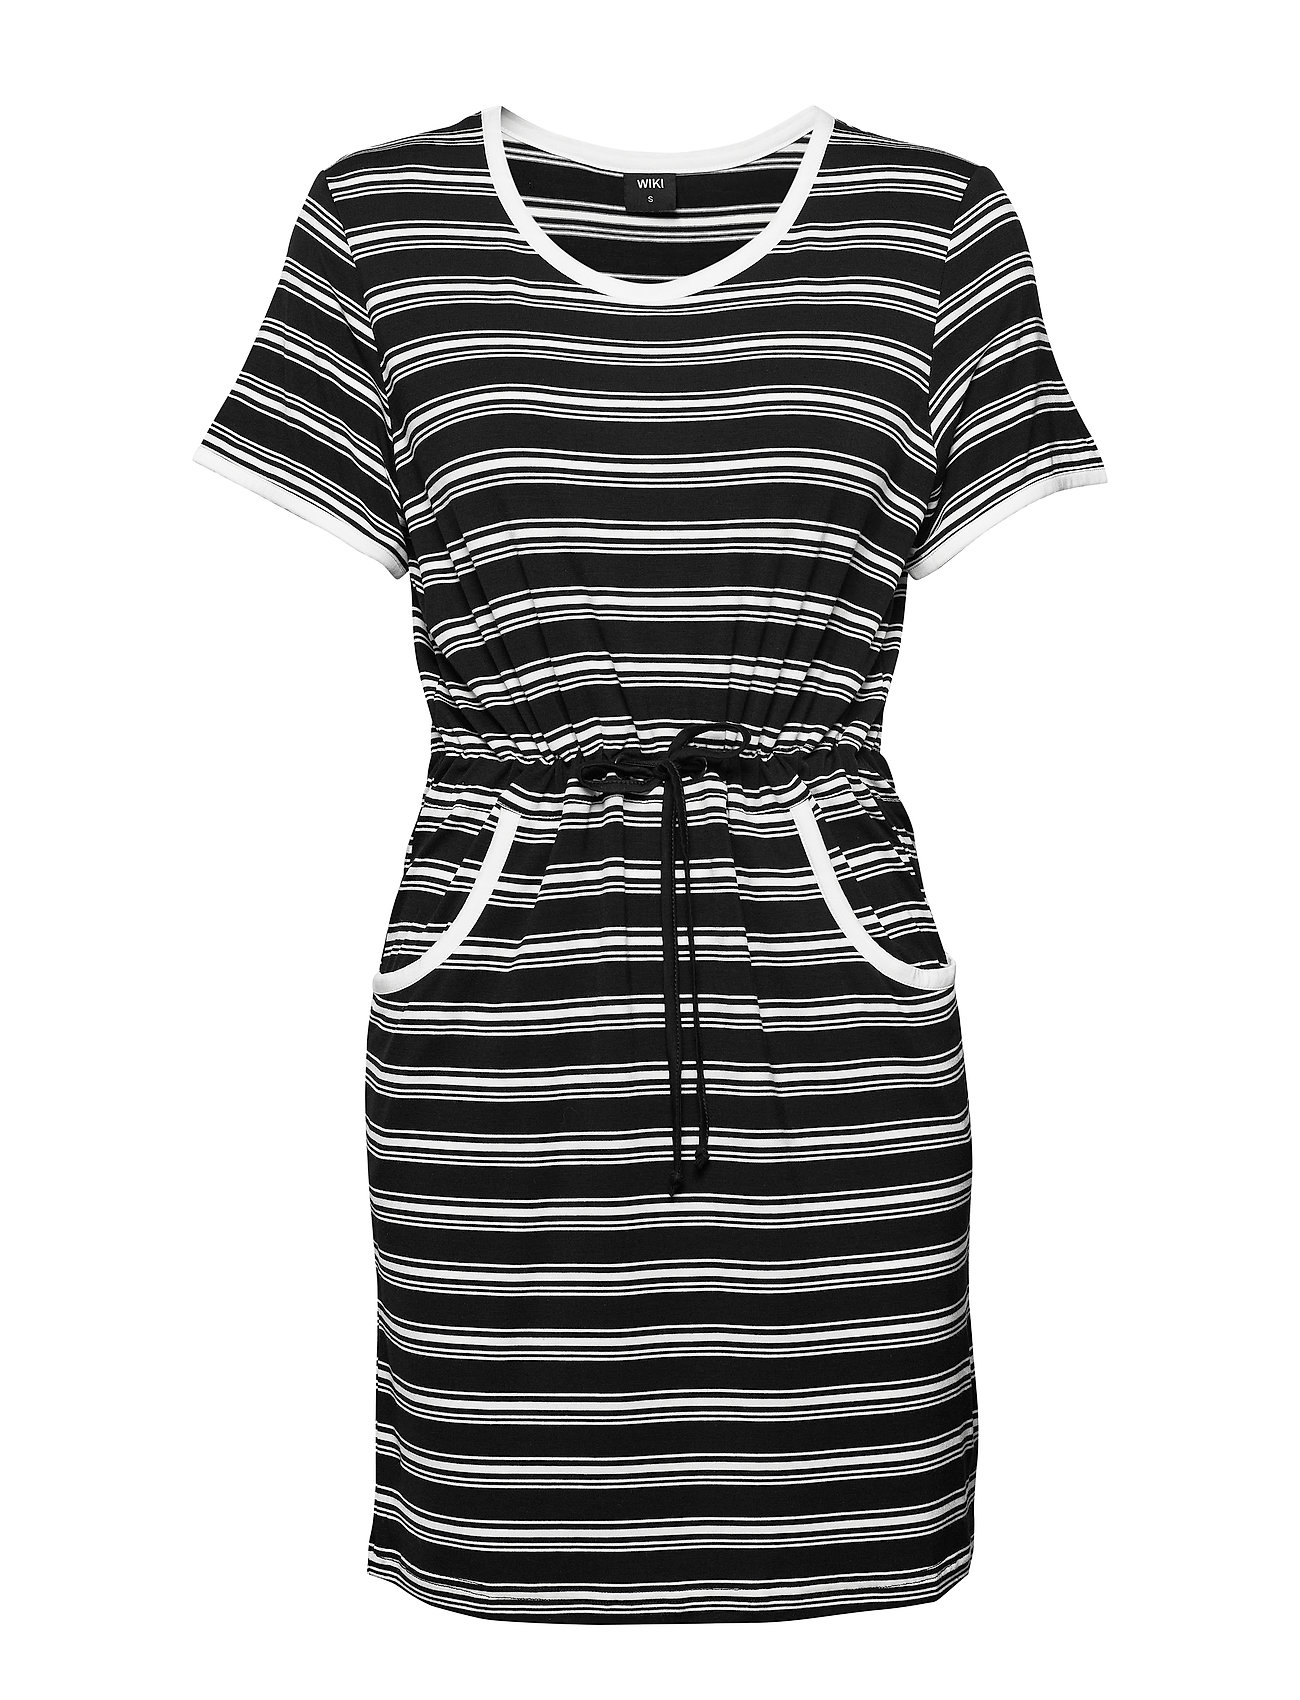 Image of Bamboo Beach Dress Badetøj Sort Wiki (3377374495)